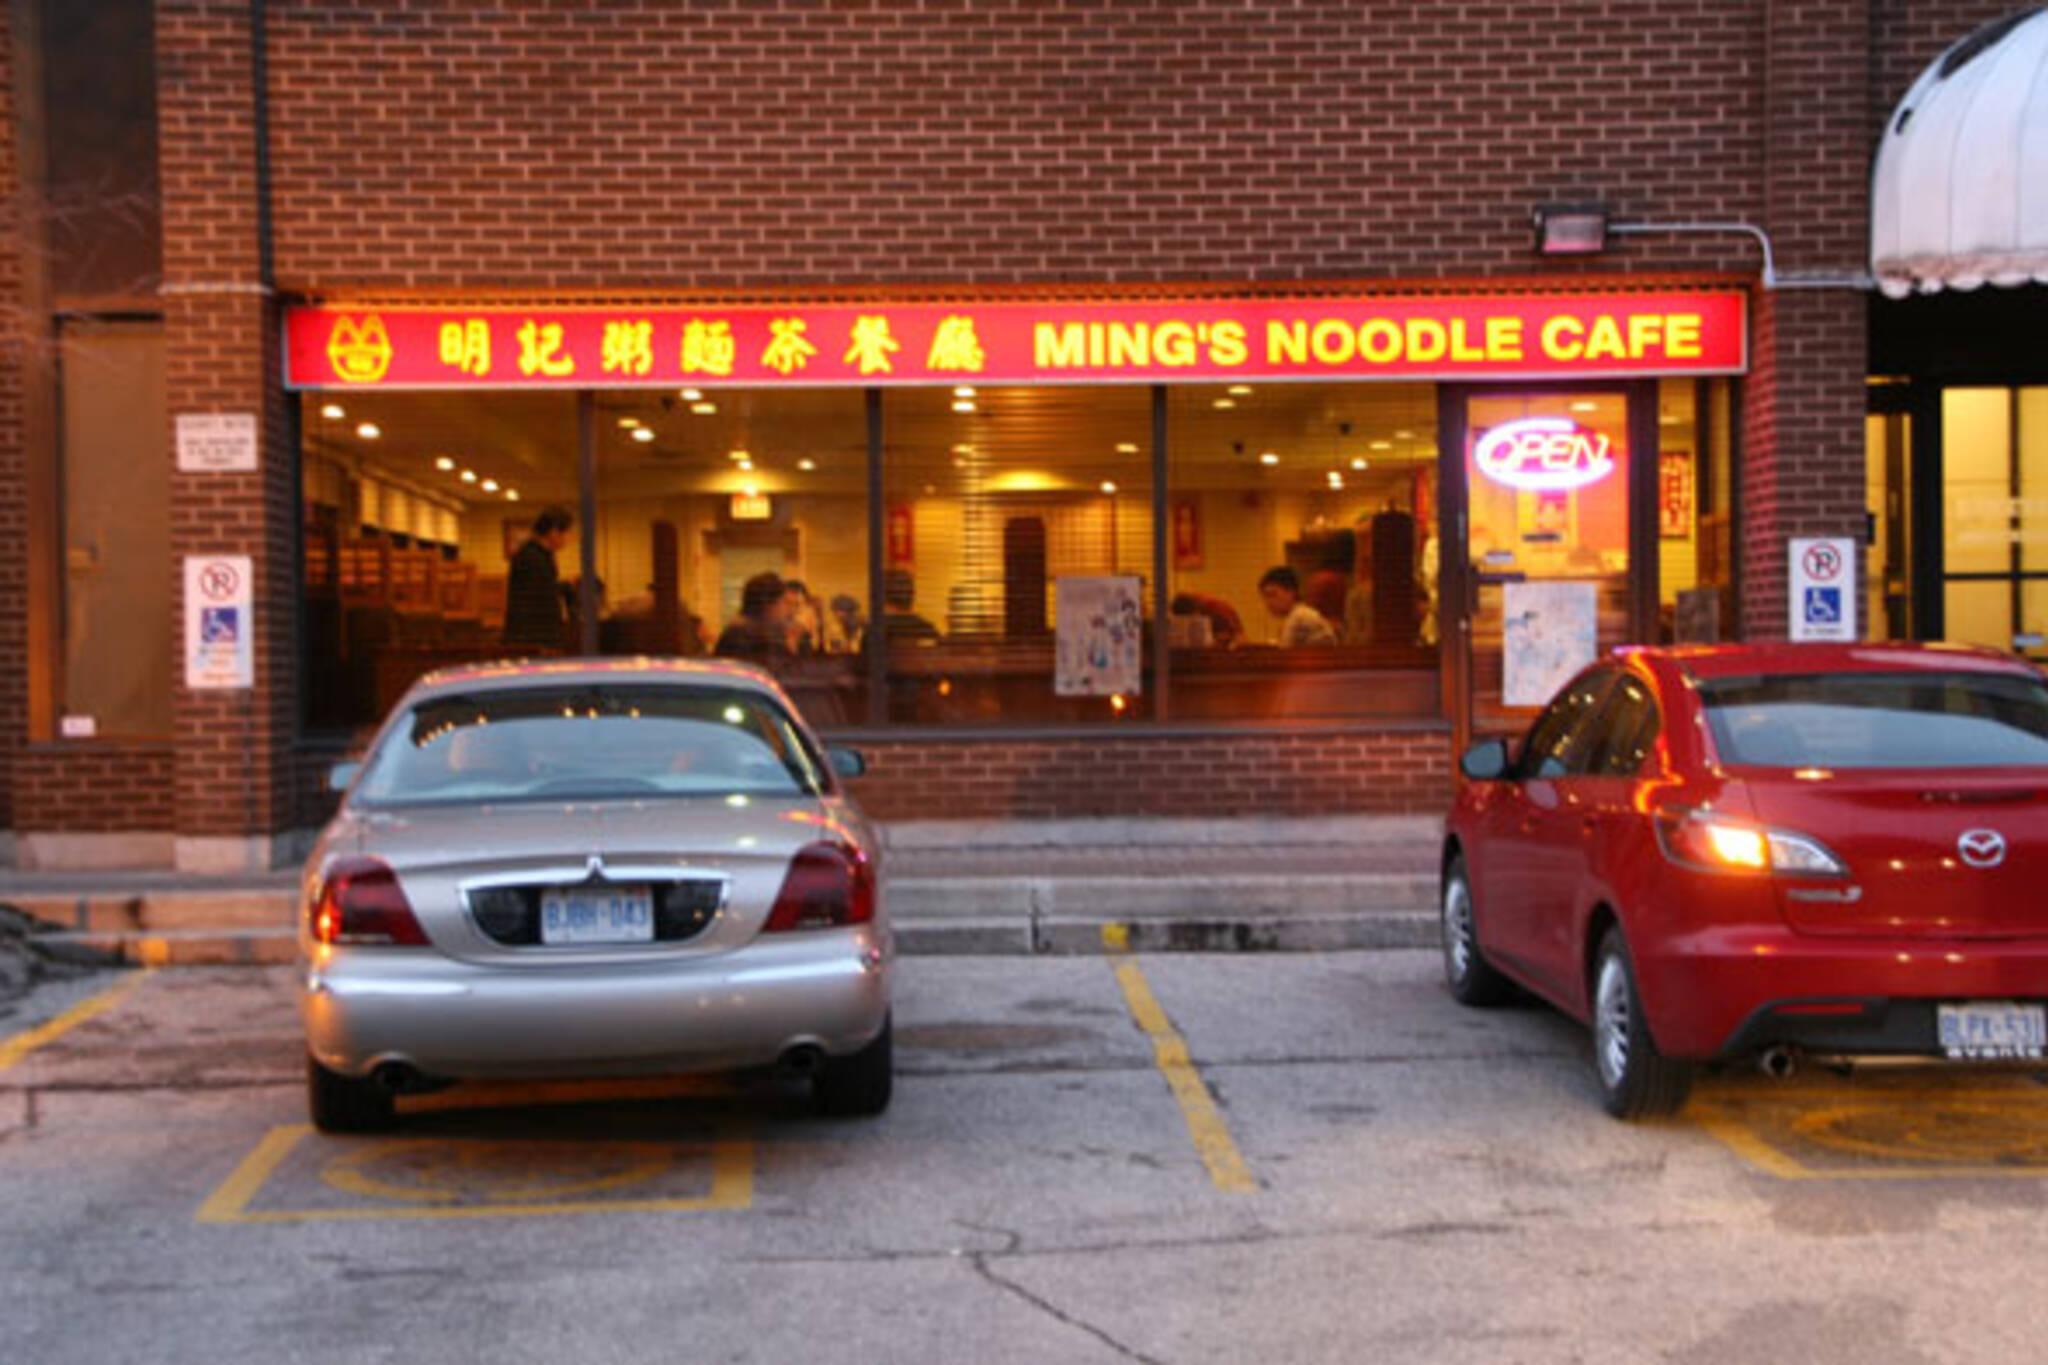 Mings Noodle Cafe